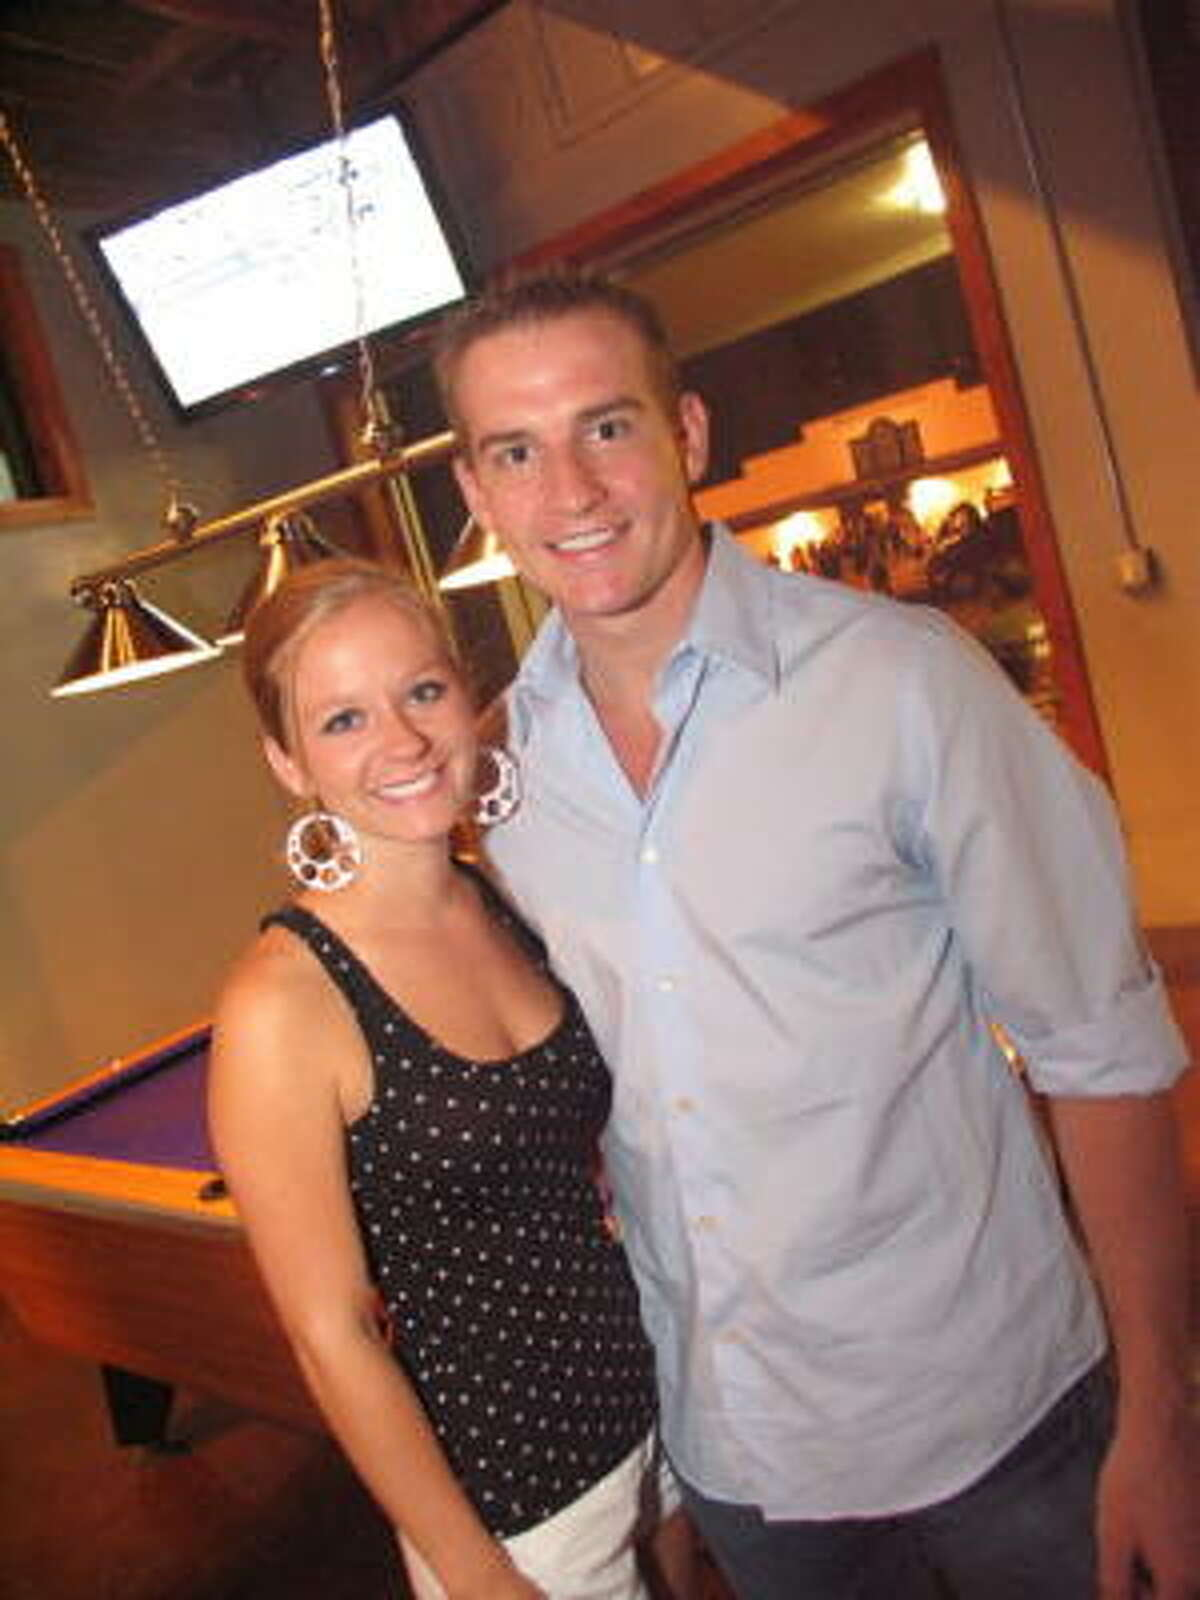 Kristin Tipton, left, and Chris Landry